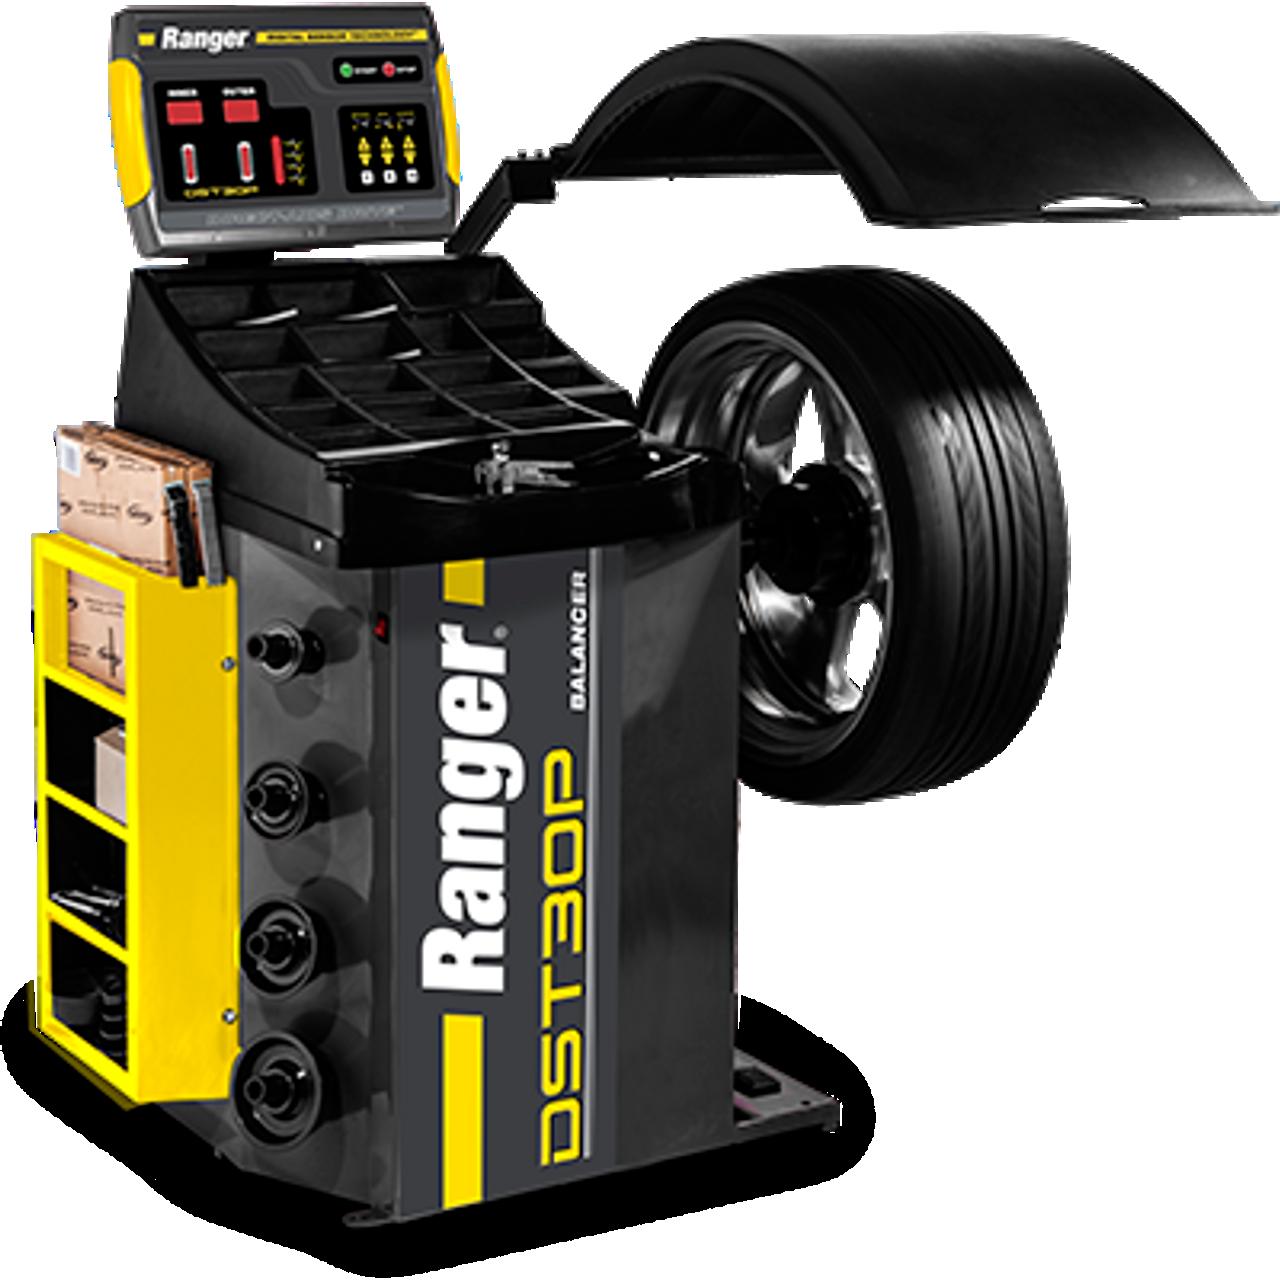 dst30p-wheel-balancer-5140300-ranger-products